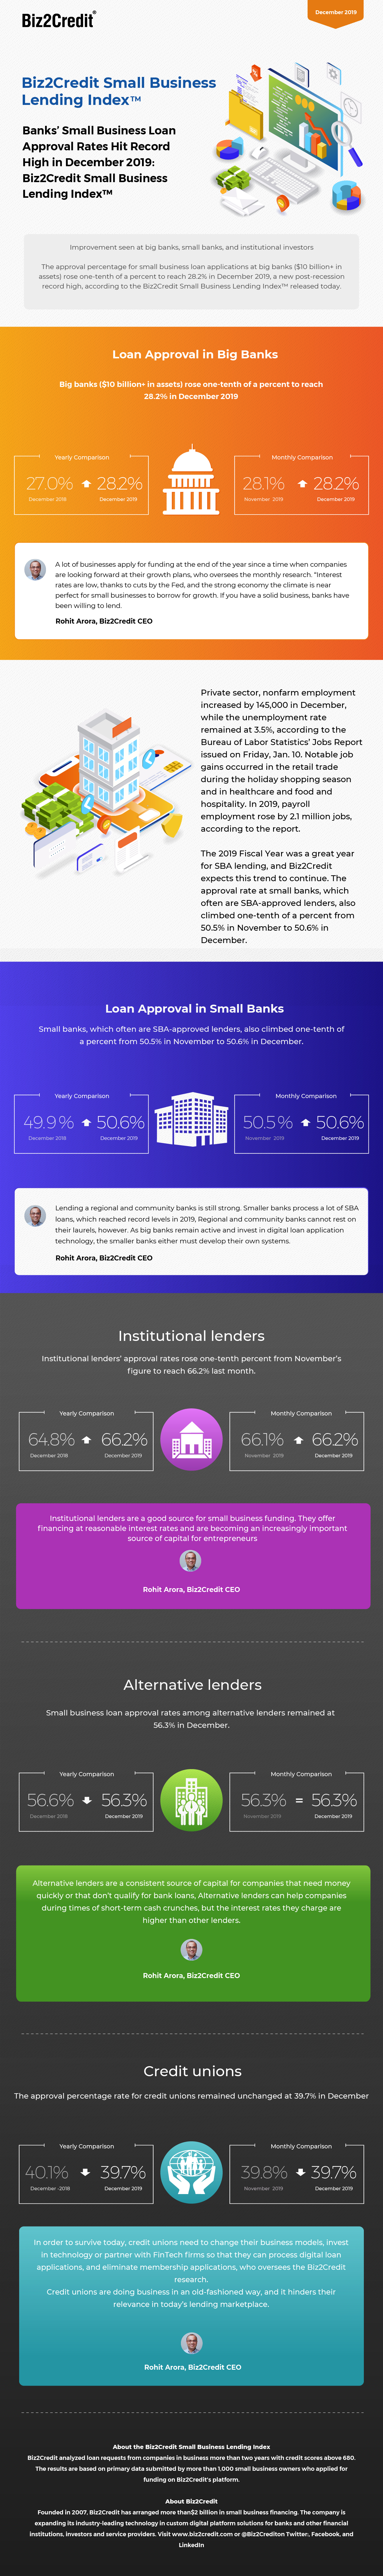 November 2019 Lending Index Infographic